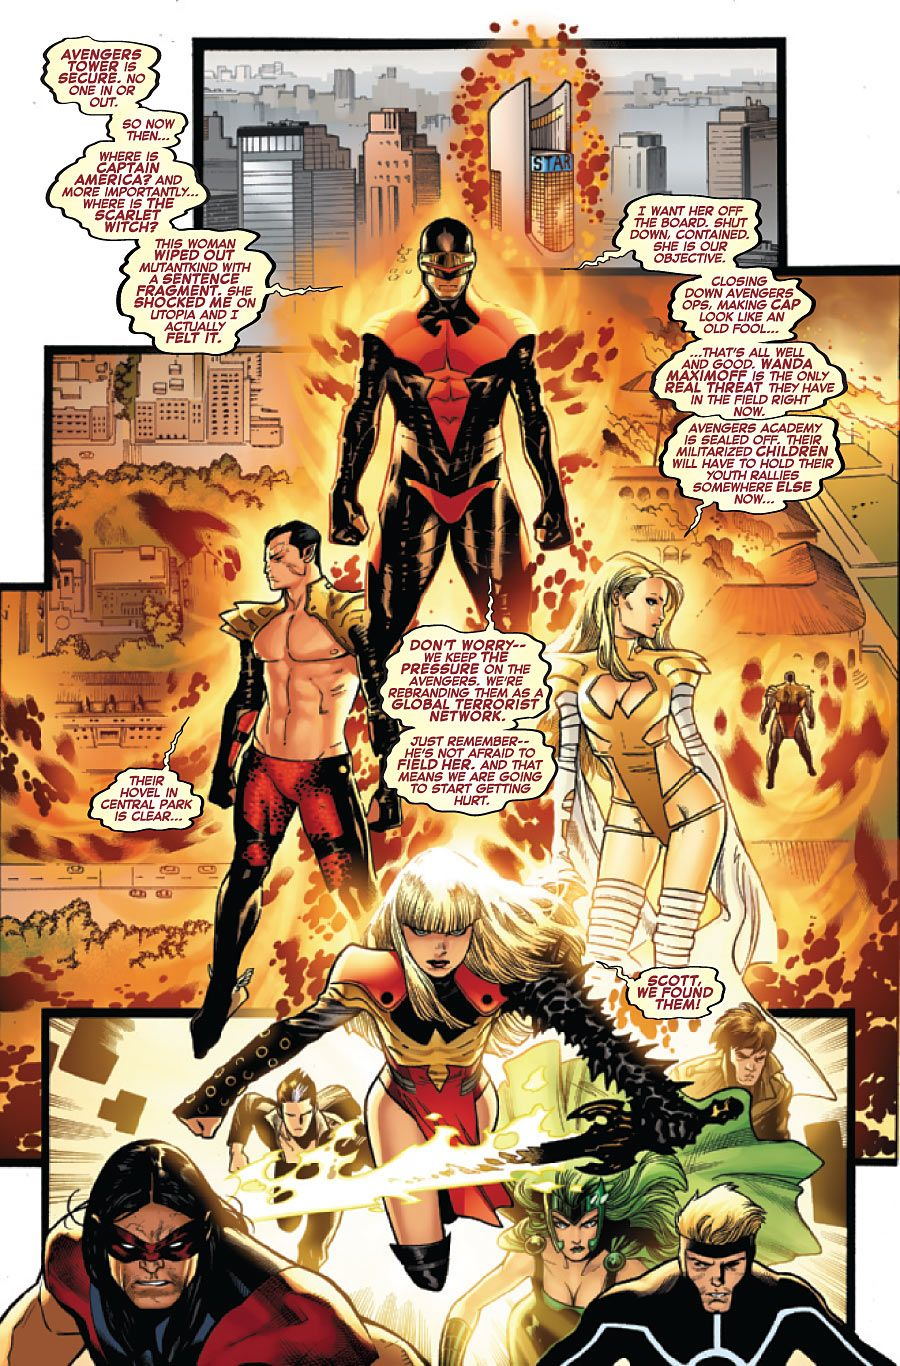 Avengers Vs X Men 7 Page 8 Of 10 Art By Oliver Coipel Marvel Comics Art Comics Marvel Heroes